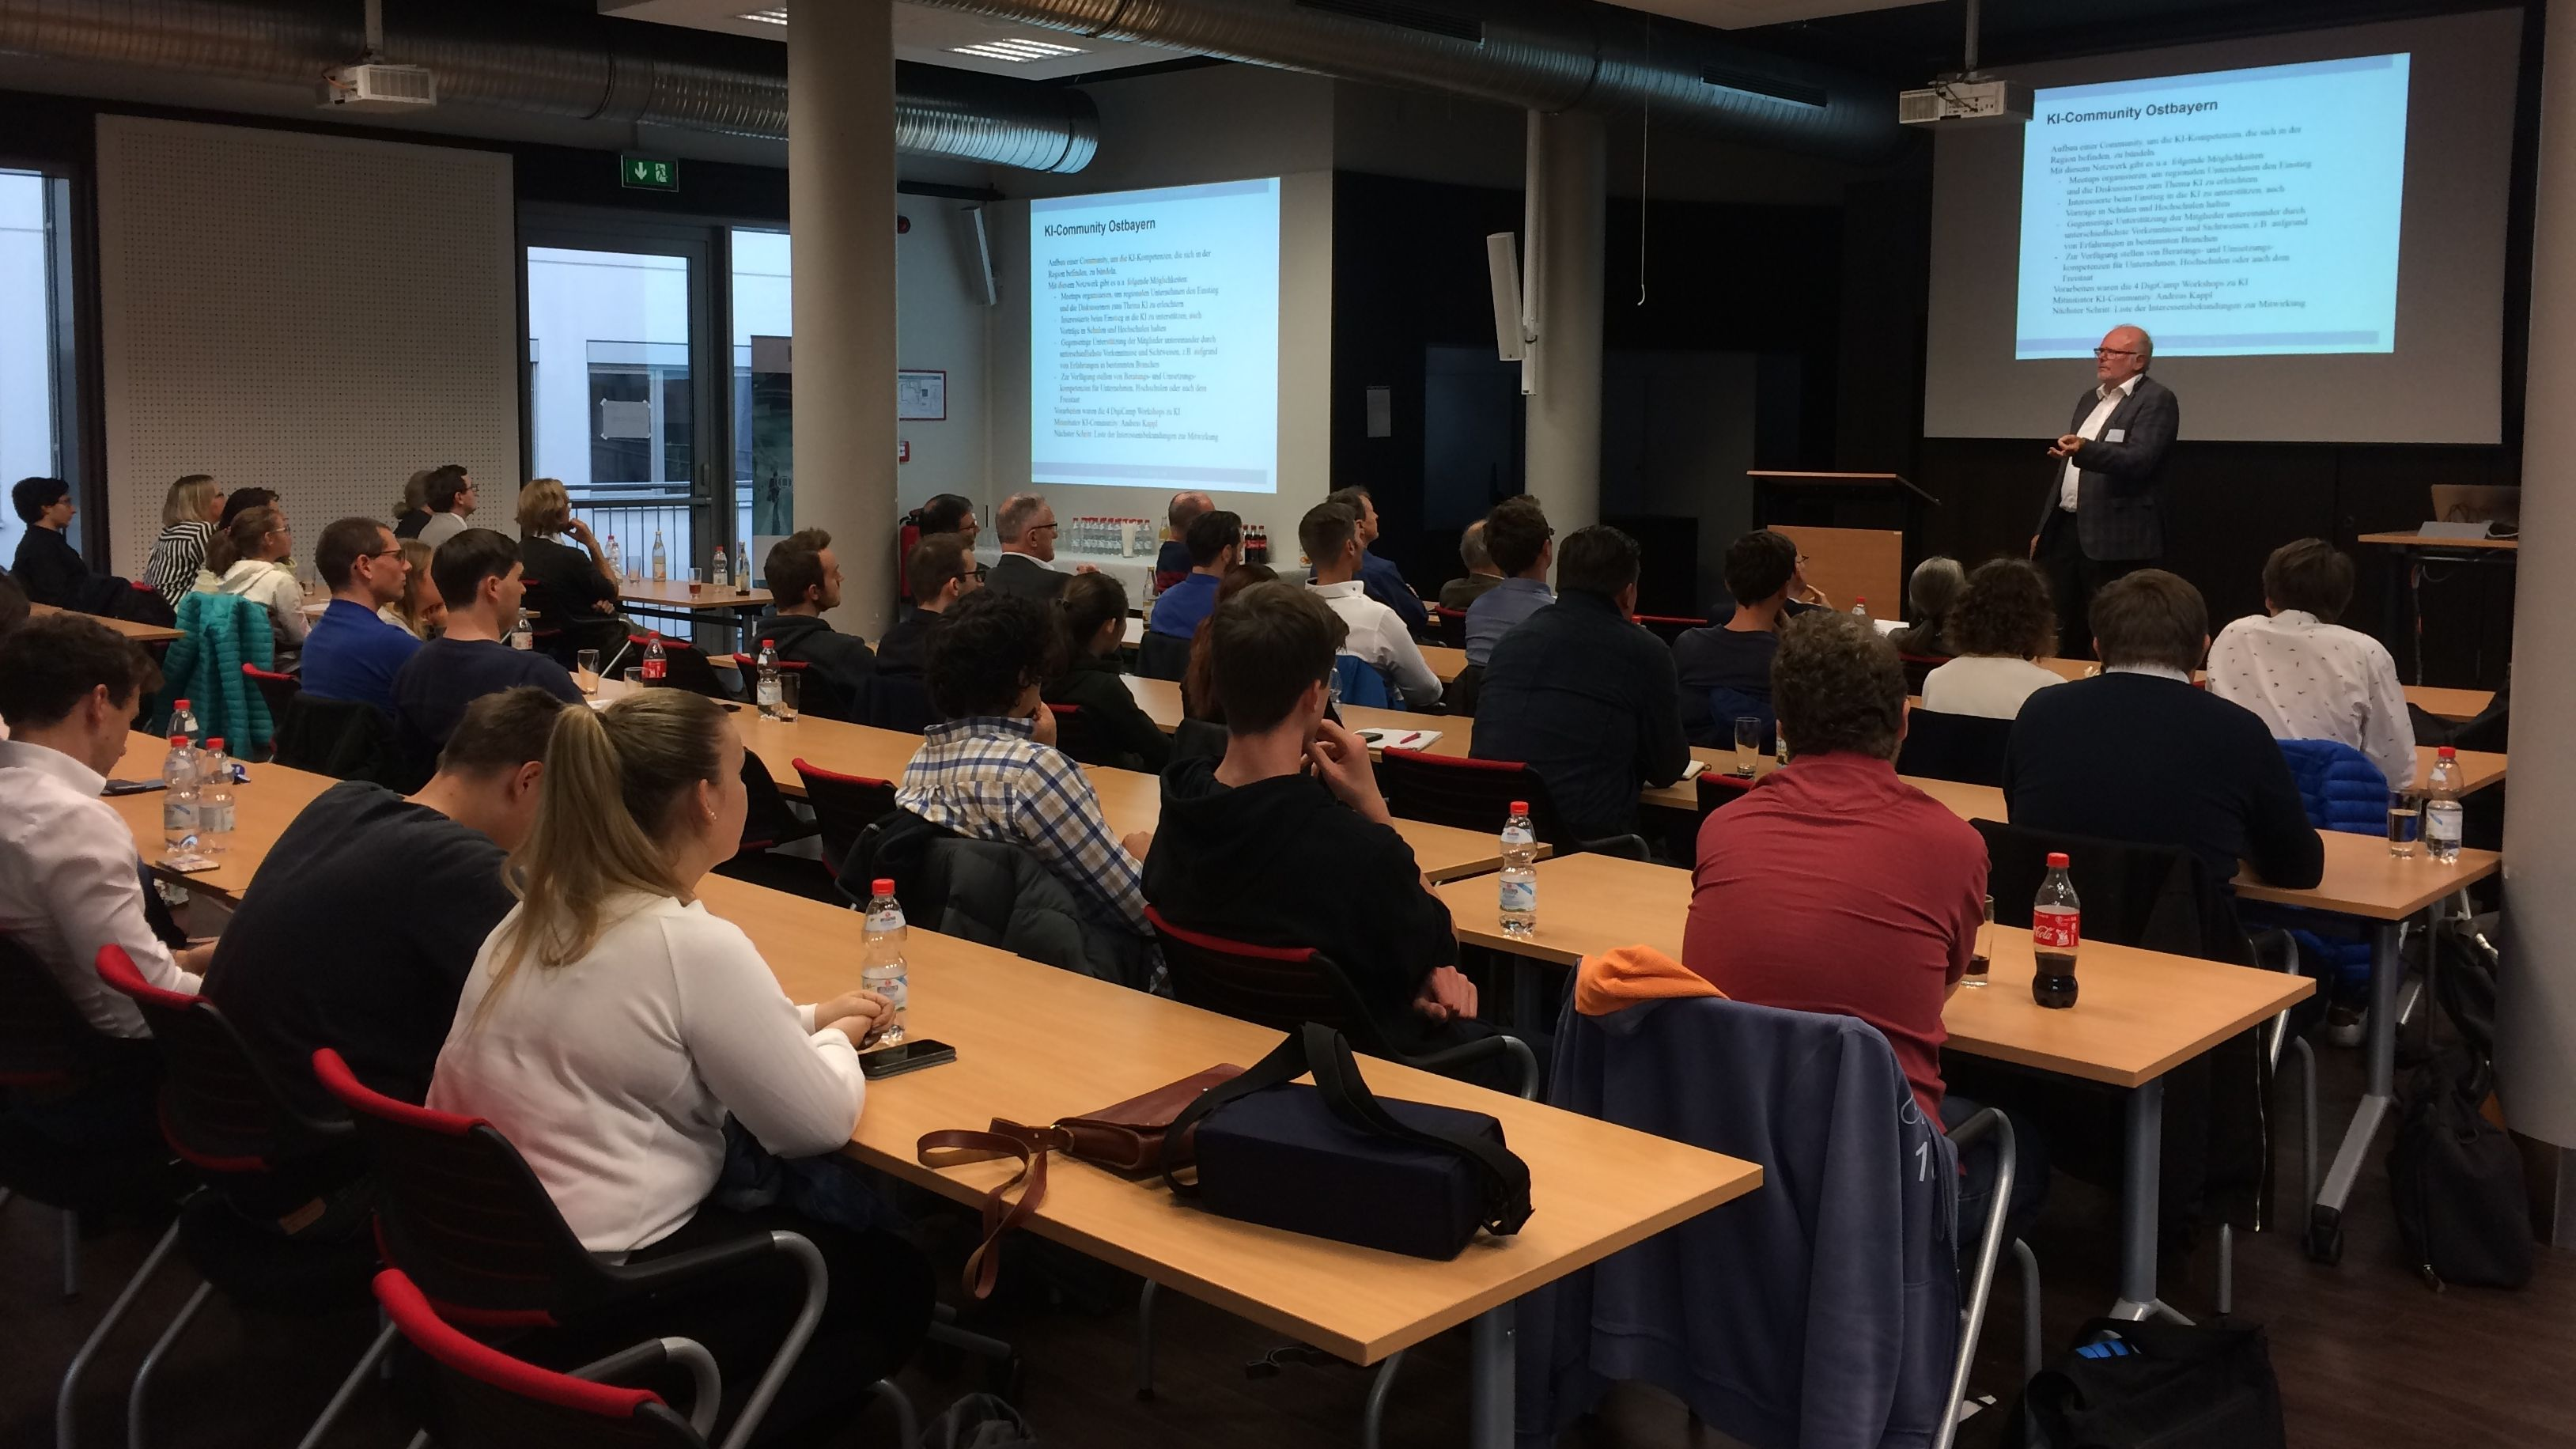 Professor Heribert Popp bei der Eröffnung des Studiengangs KI